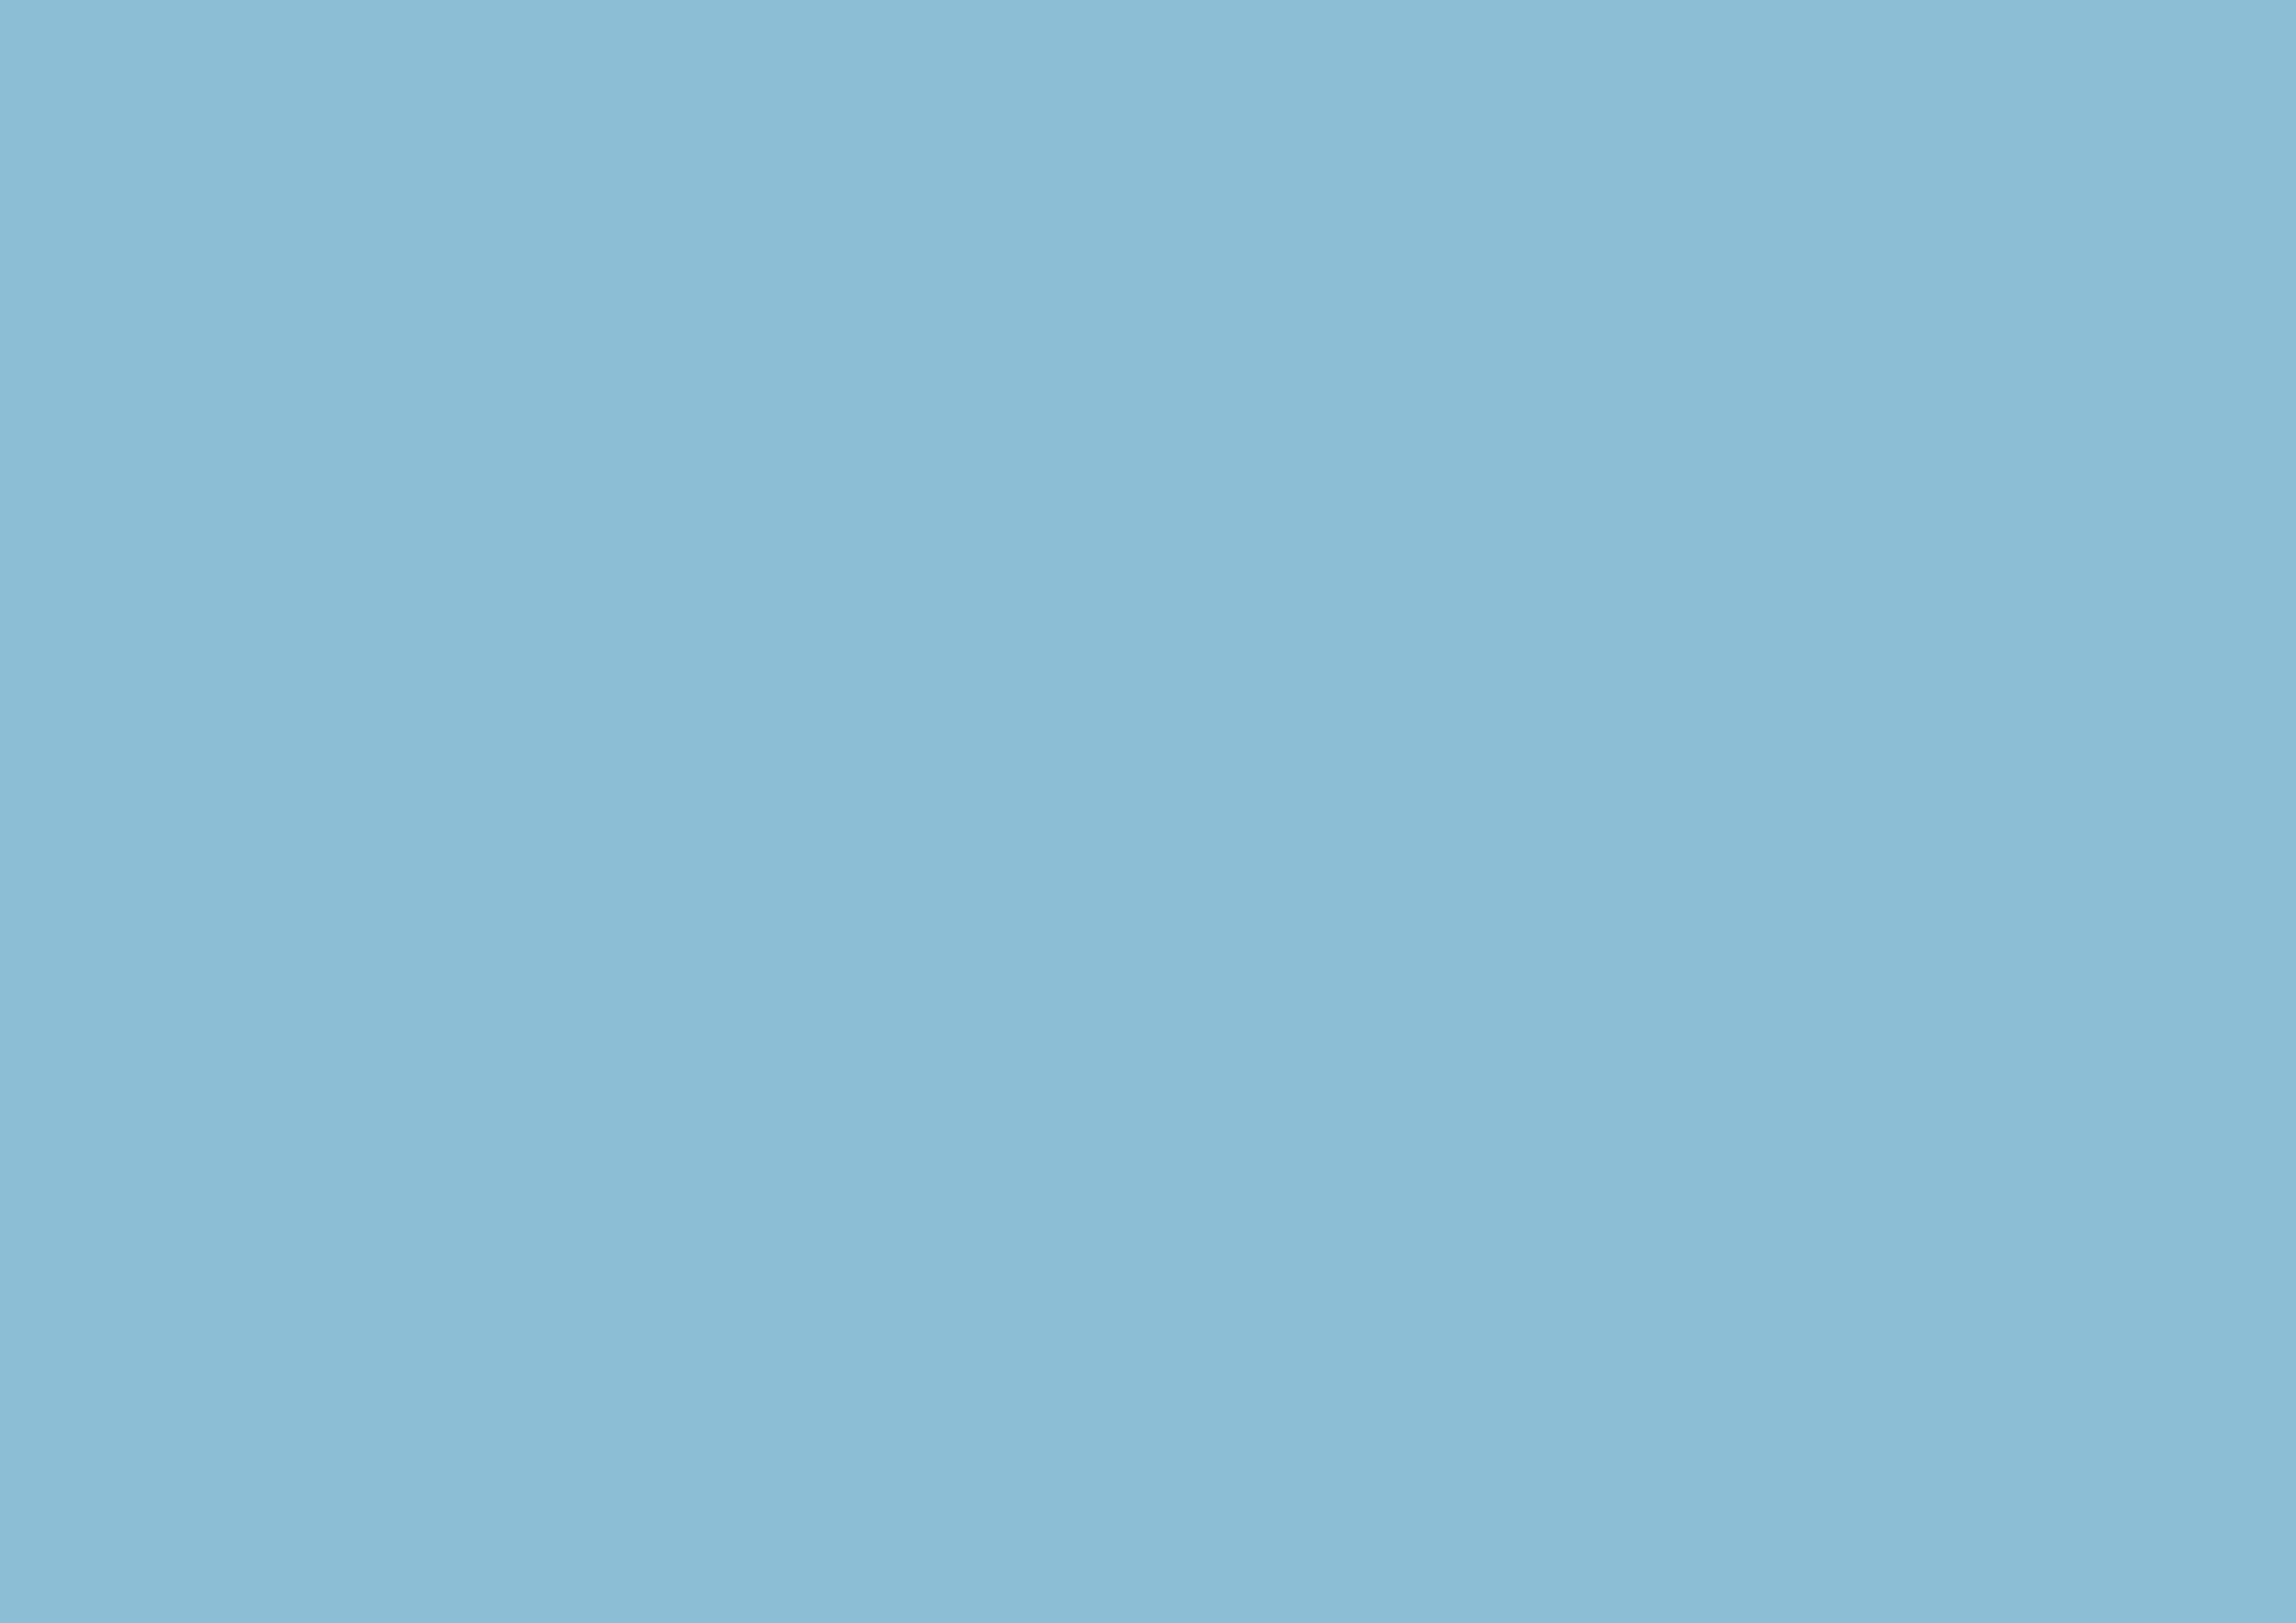 3508x2480 Dark Sky Blue Solid Color Background